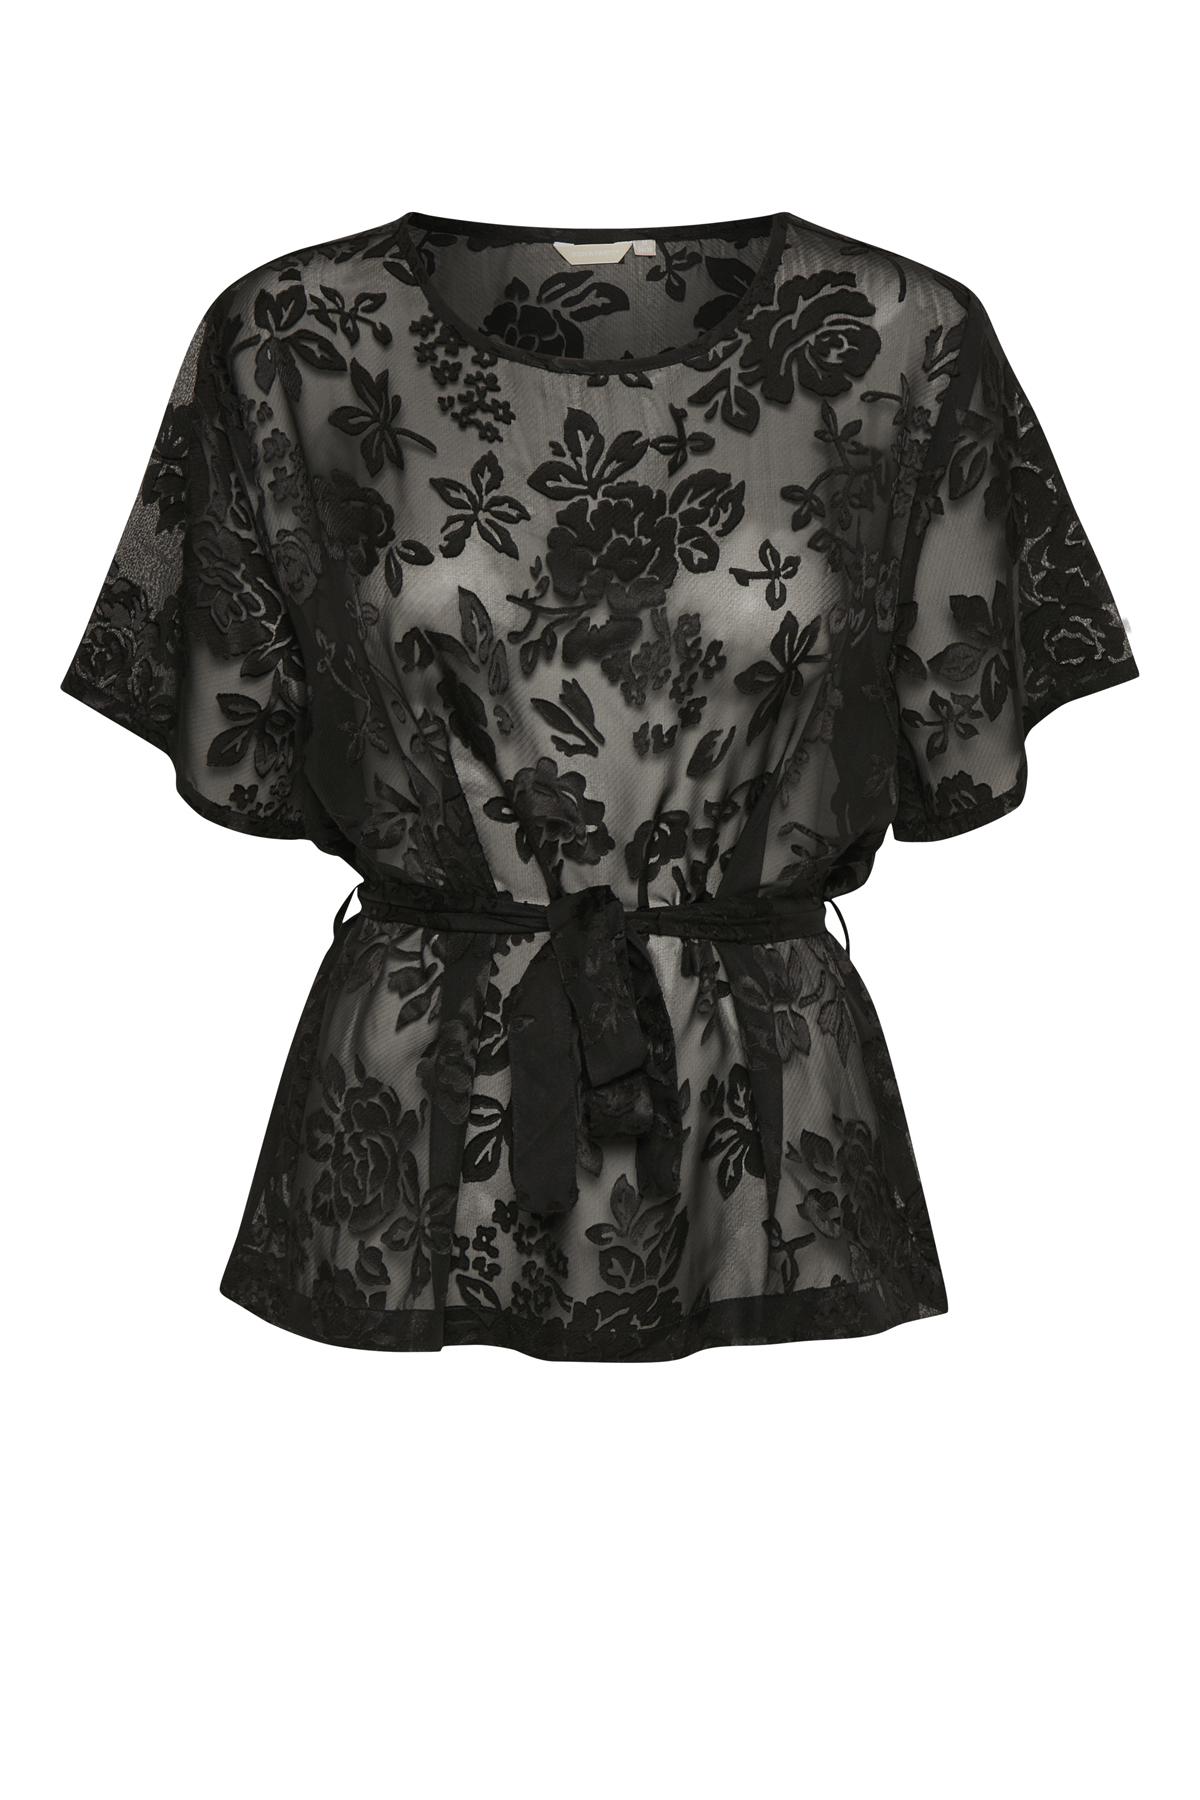 Schwarz Kurzarm-Bluse  von Bon'A Parte – Shoppen Sie Schwarz Kurzarm-Bluse  ab Gr. S-2XL hier